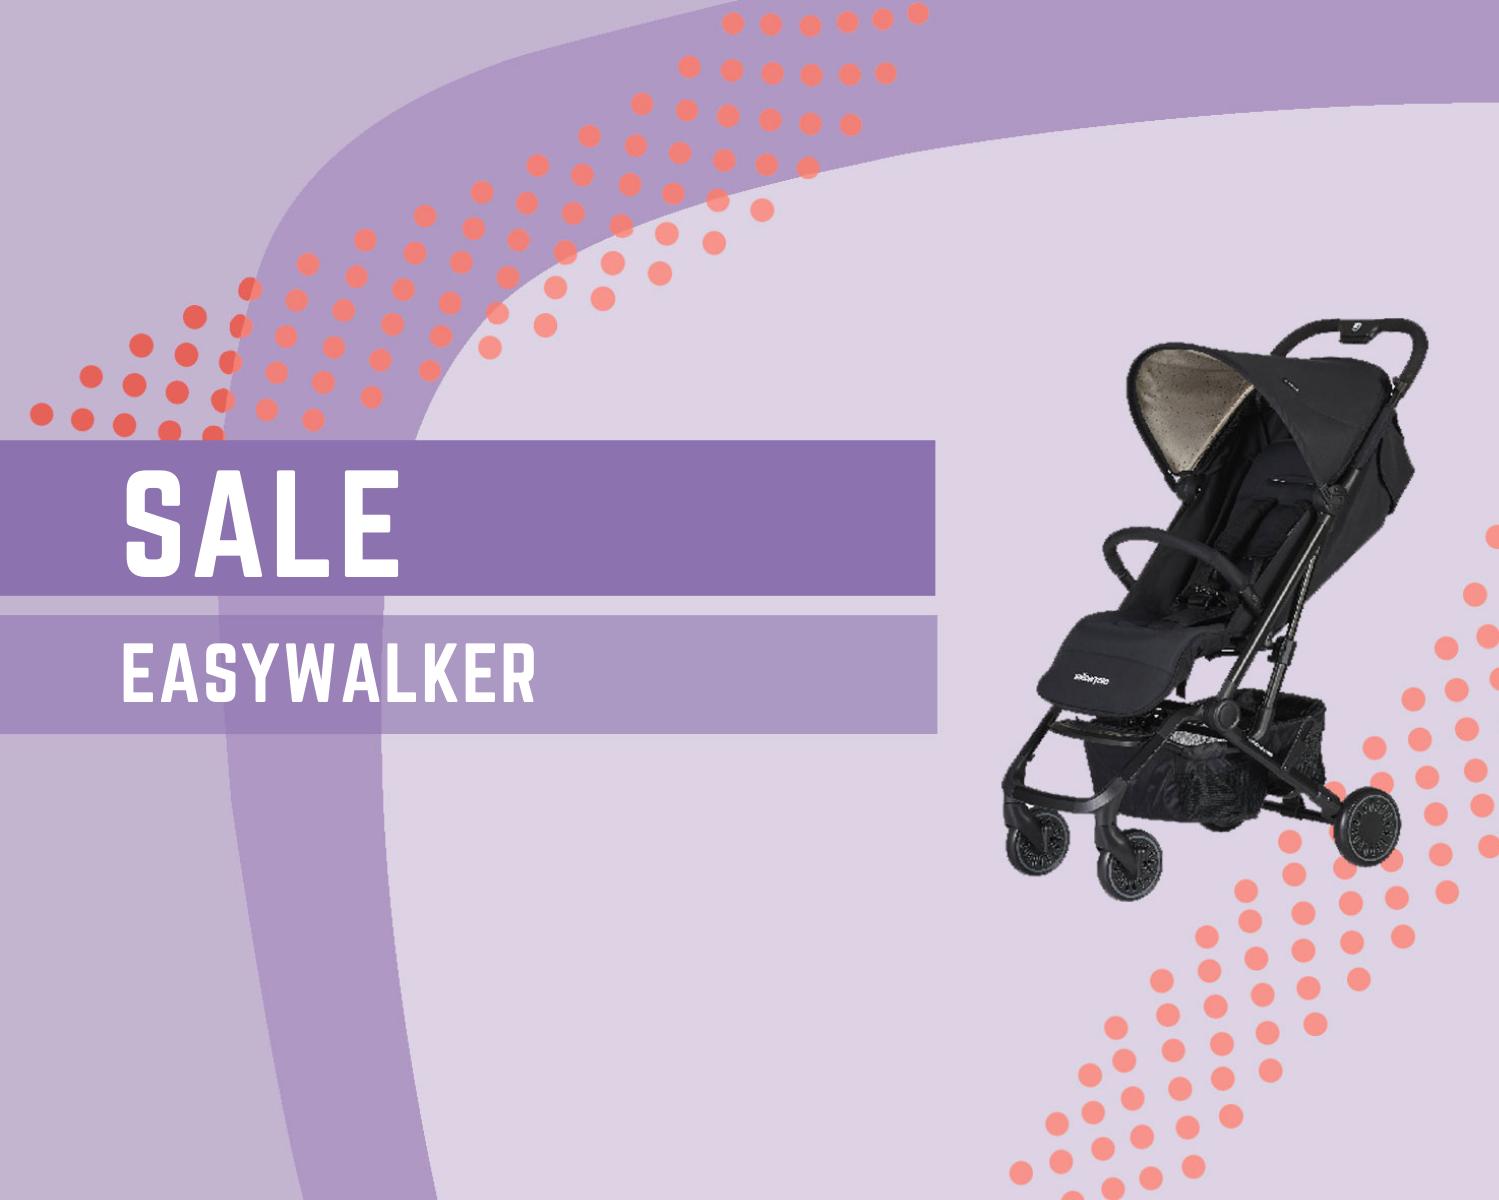 Easywalker Sale